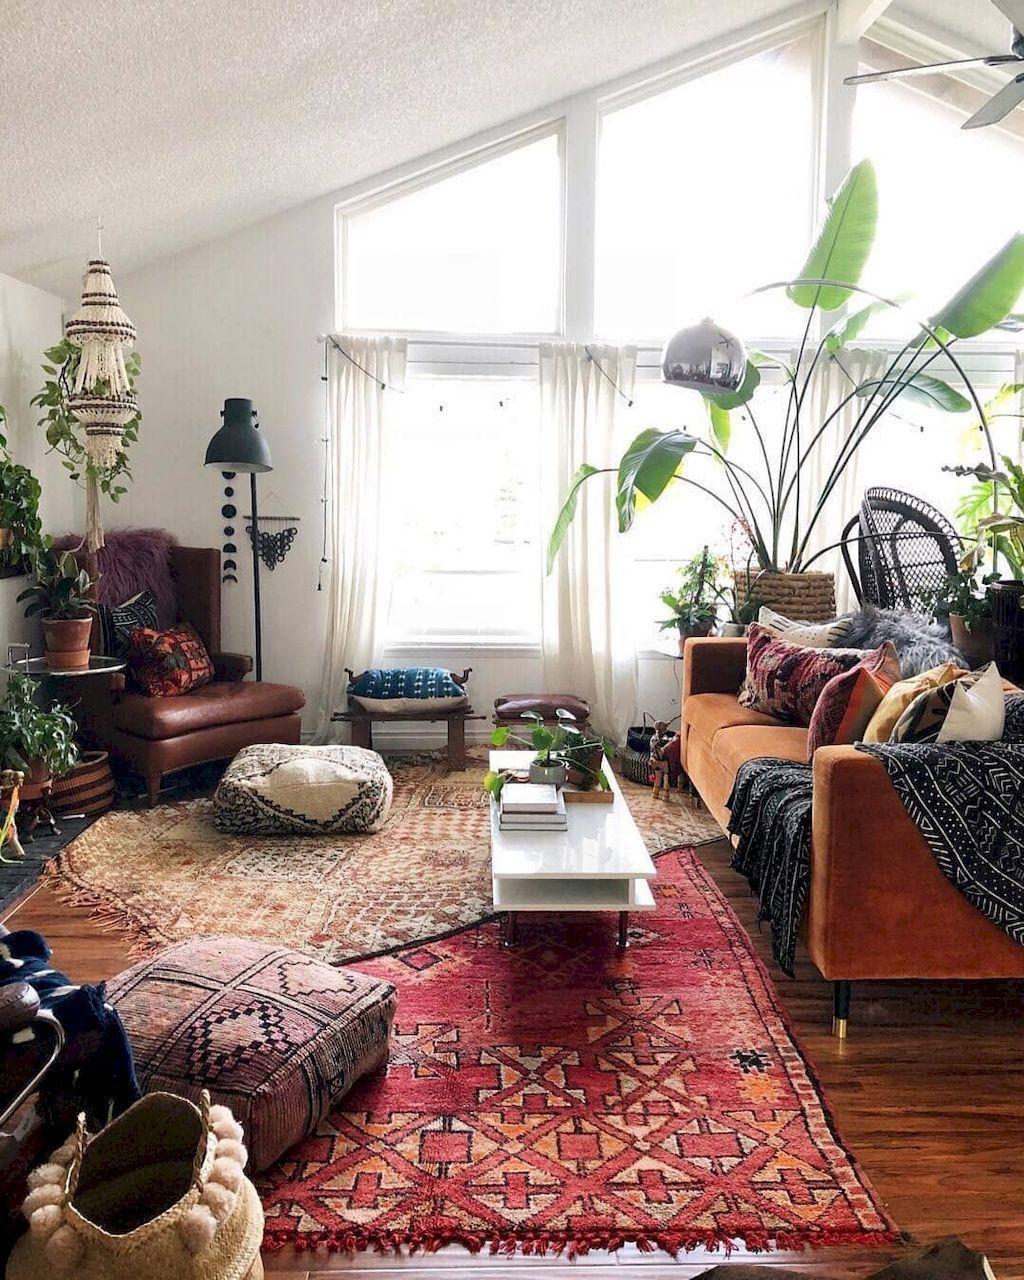 70 Apartment Living Room Decorating Ideas - homixover.com#apartment #decorating #homixovercom #ideas #living #room